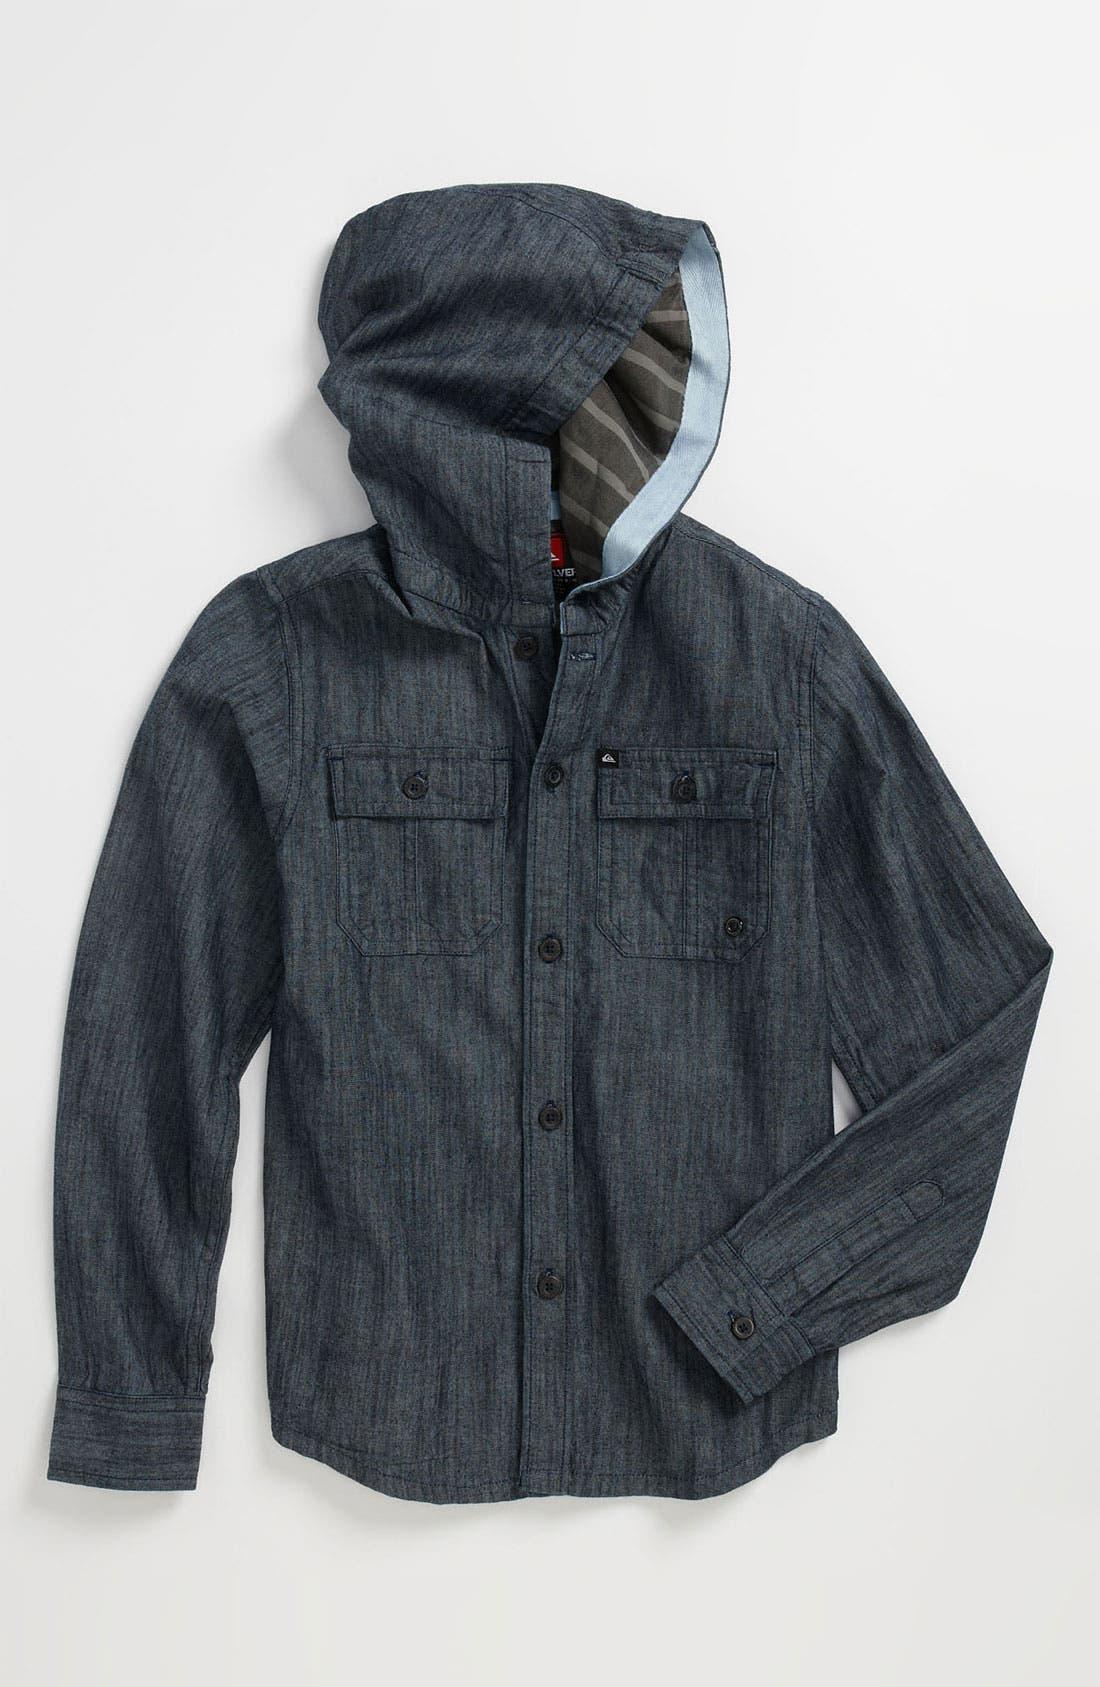 Main Image - Quiksilver 'Morning Stroke' Hooded Shirt (Big Boys)